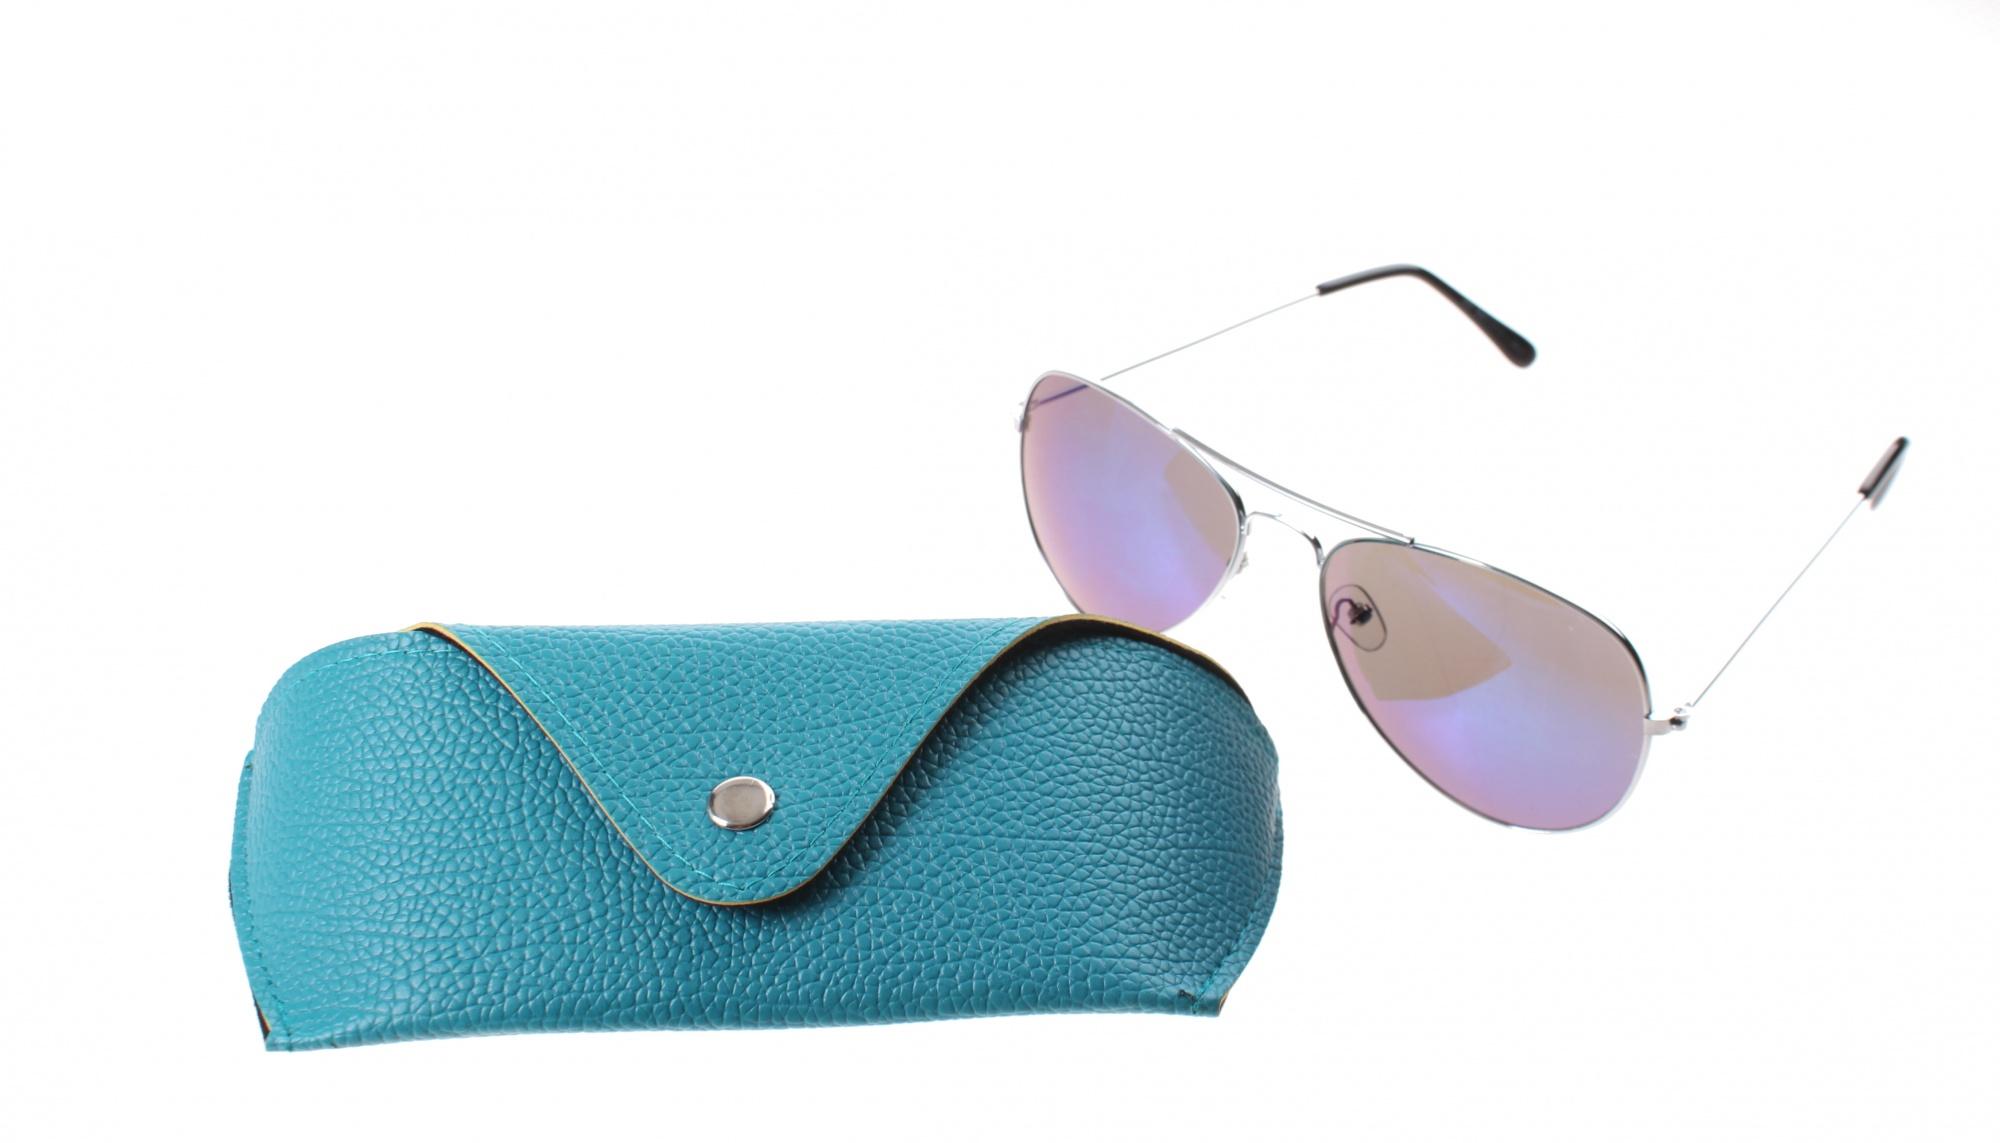 6ff1d98beb1663 Lifetime-Vision zonnebril unisex zilver met blauwe spiegellens ...